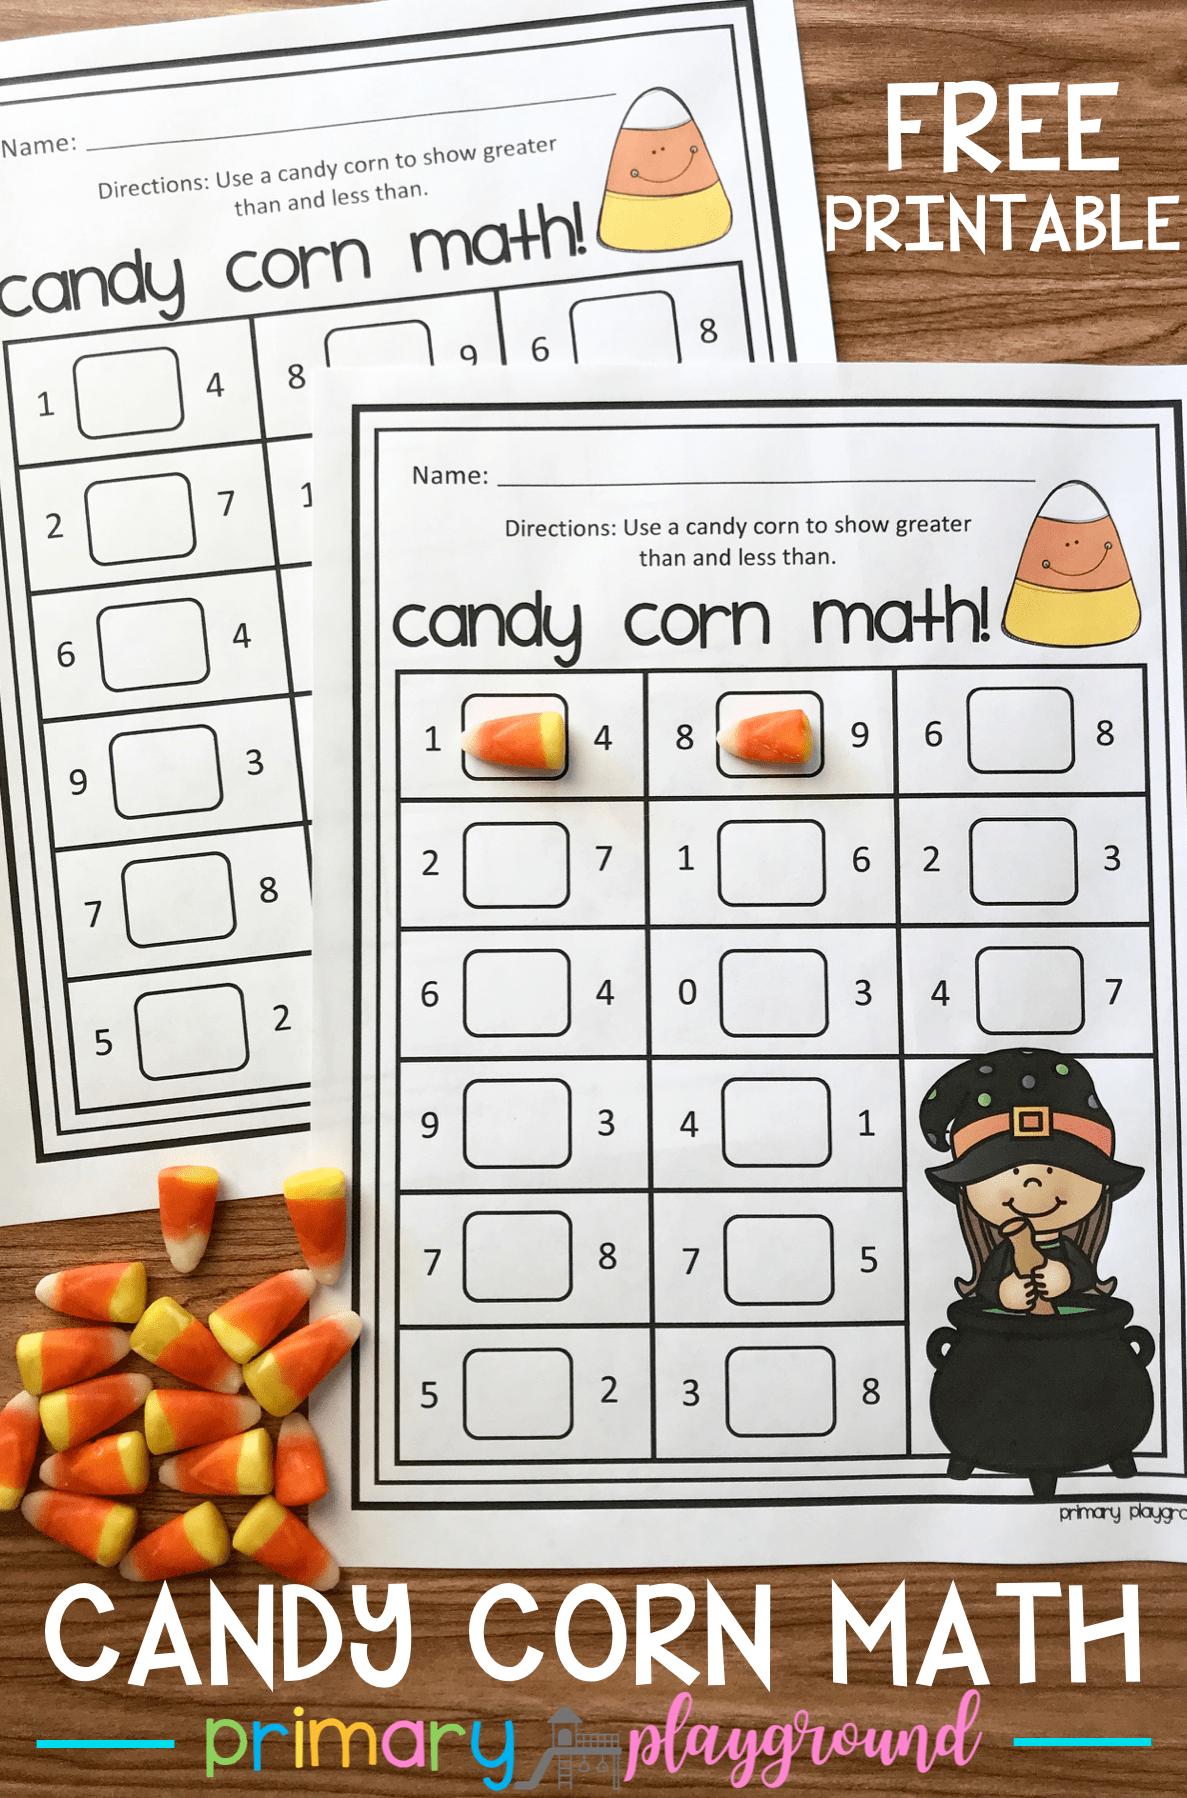 Free Printable Candy Corn Math